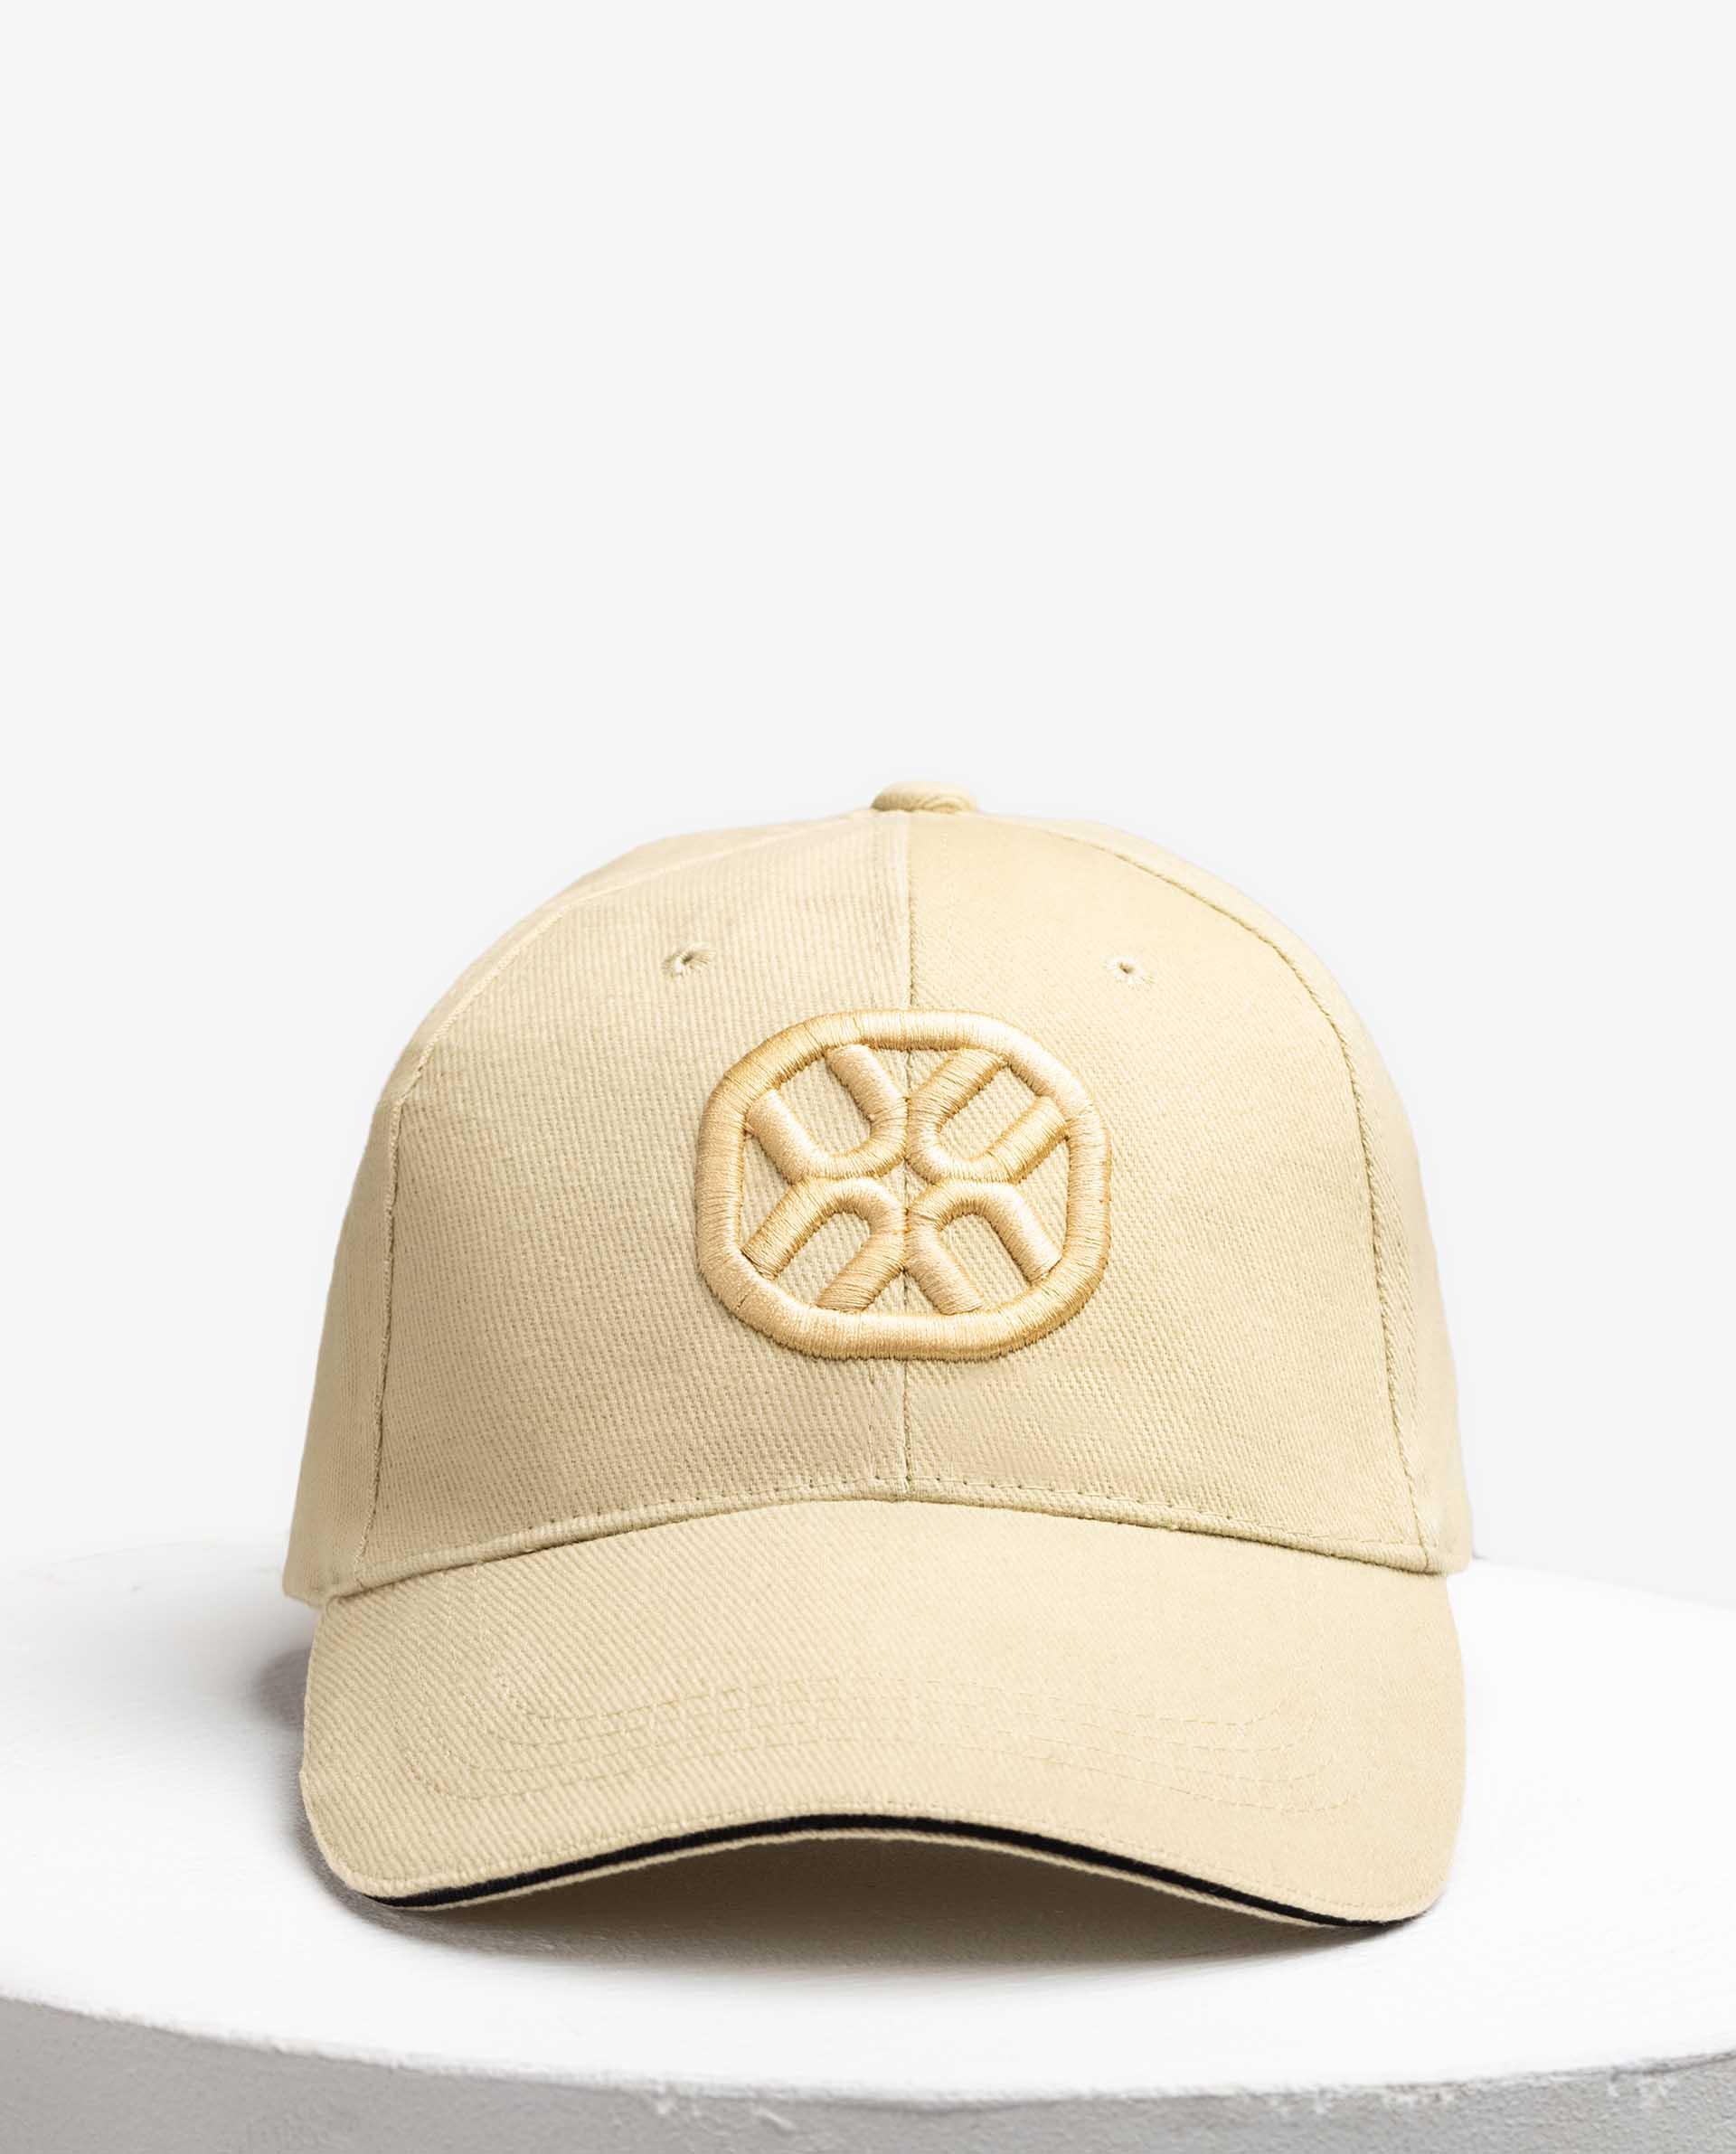 Unisa Gorras y sombreros GORRA_UNI beige